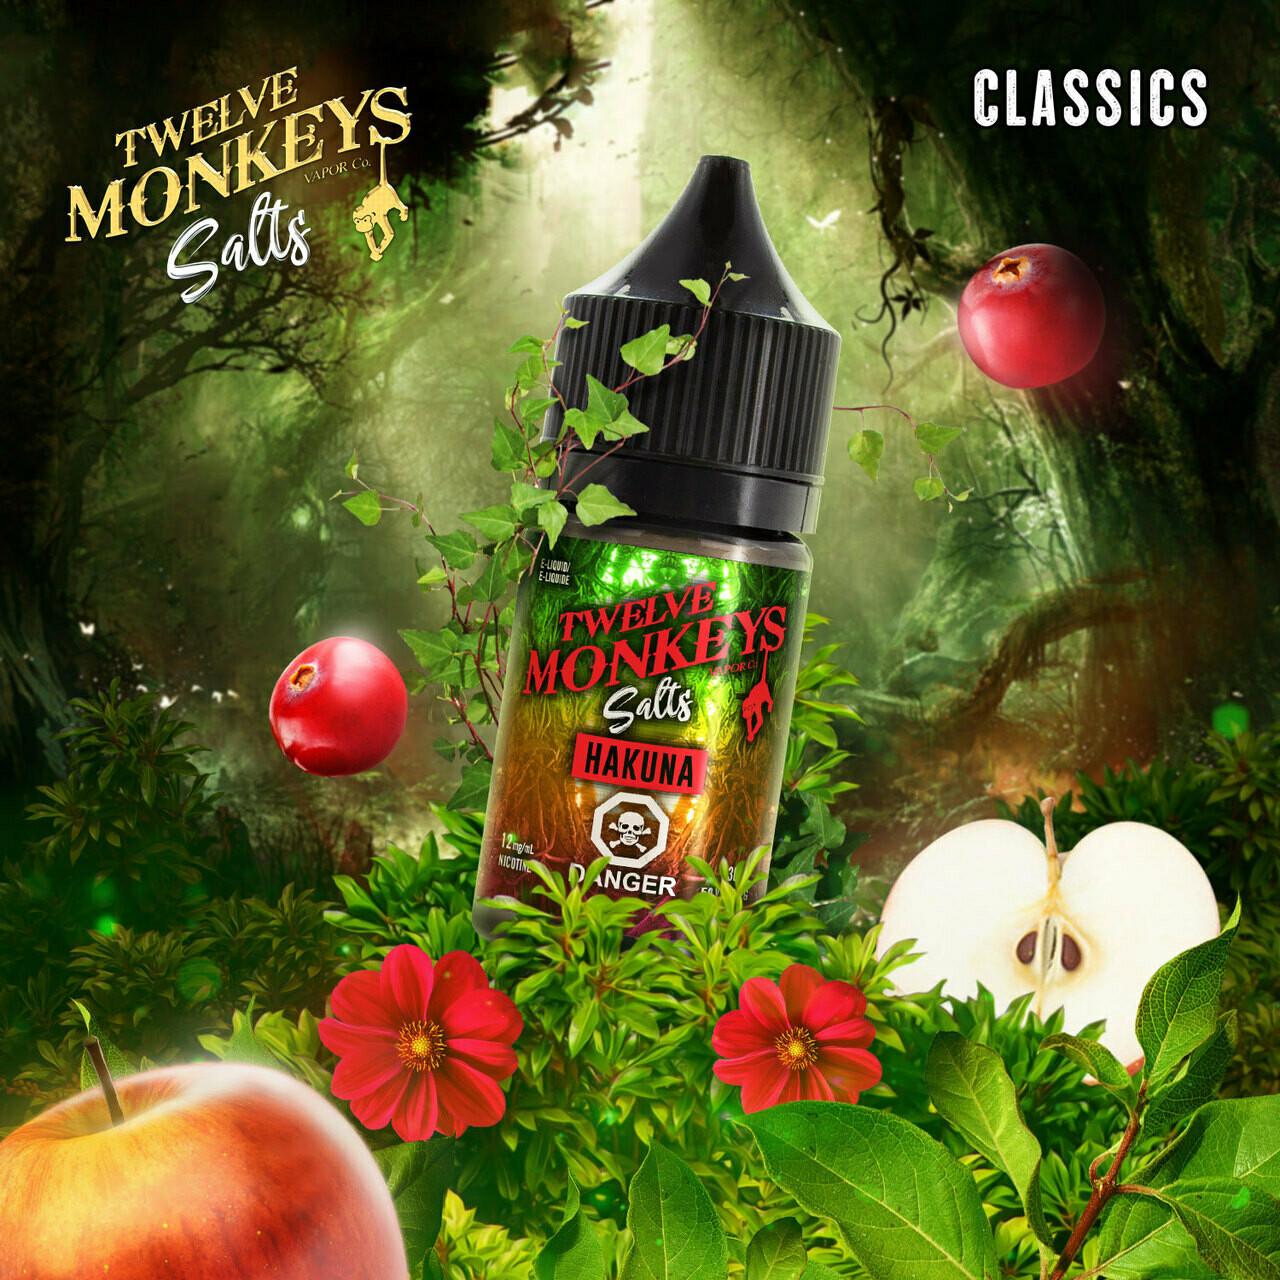 Twelve Monkeys Salt Hakuna تويلف مونكيز هاكونا نيكوتين ملحي